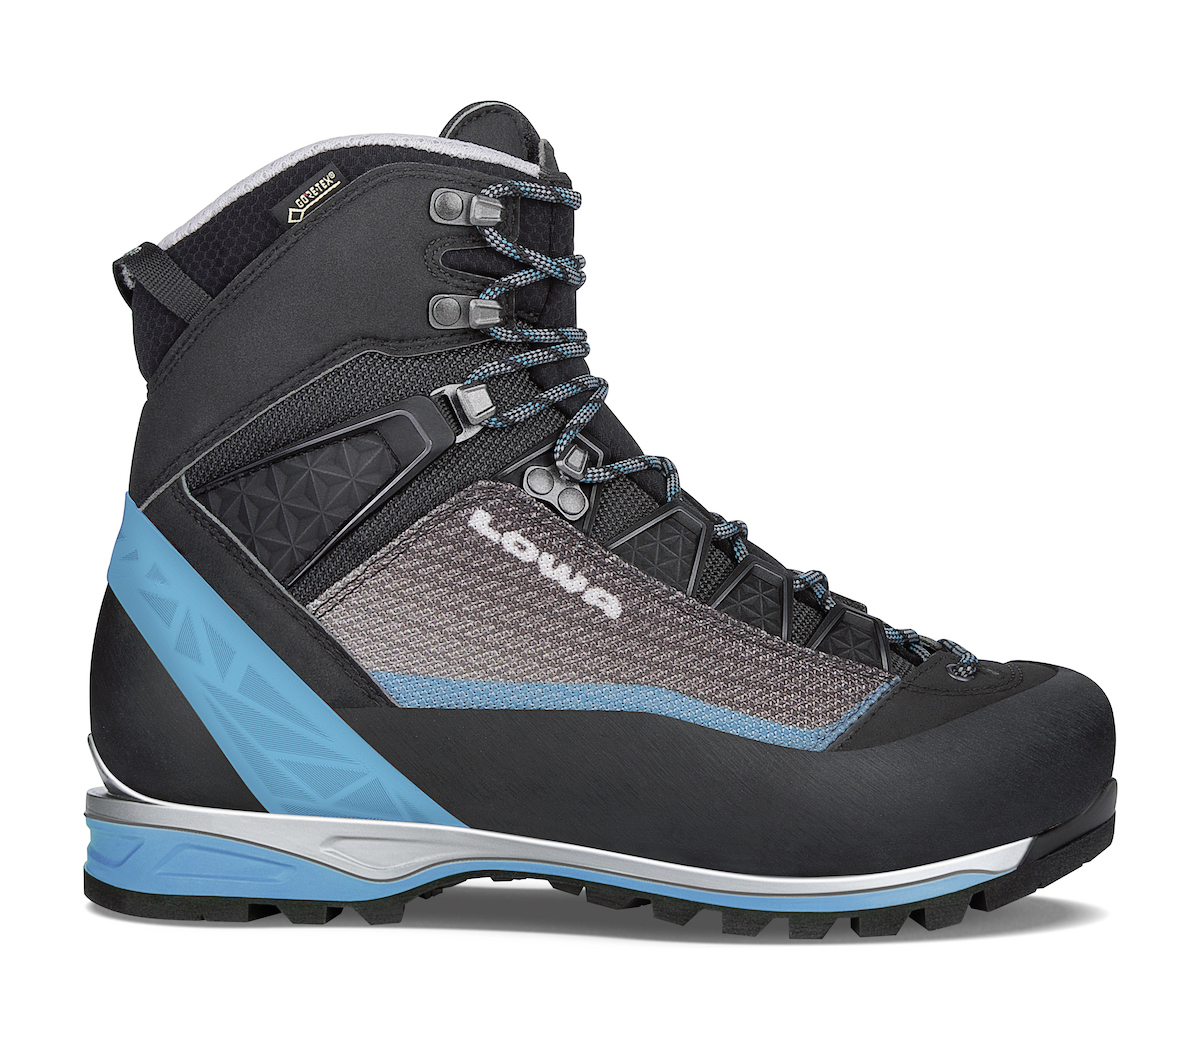 Lowa Alpine Pro GTX® Ws -  Mountaineering Boots - Women's